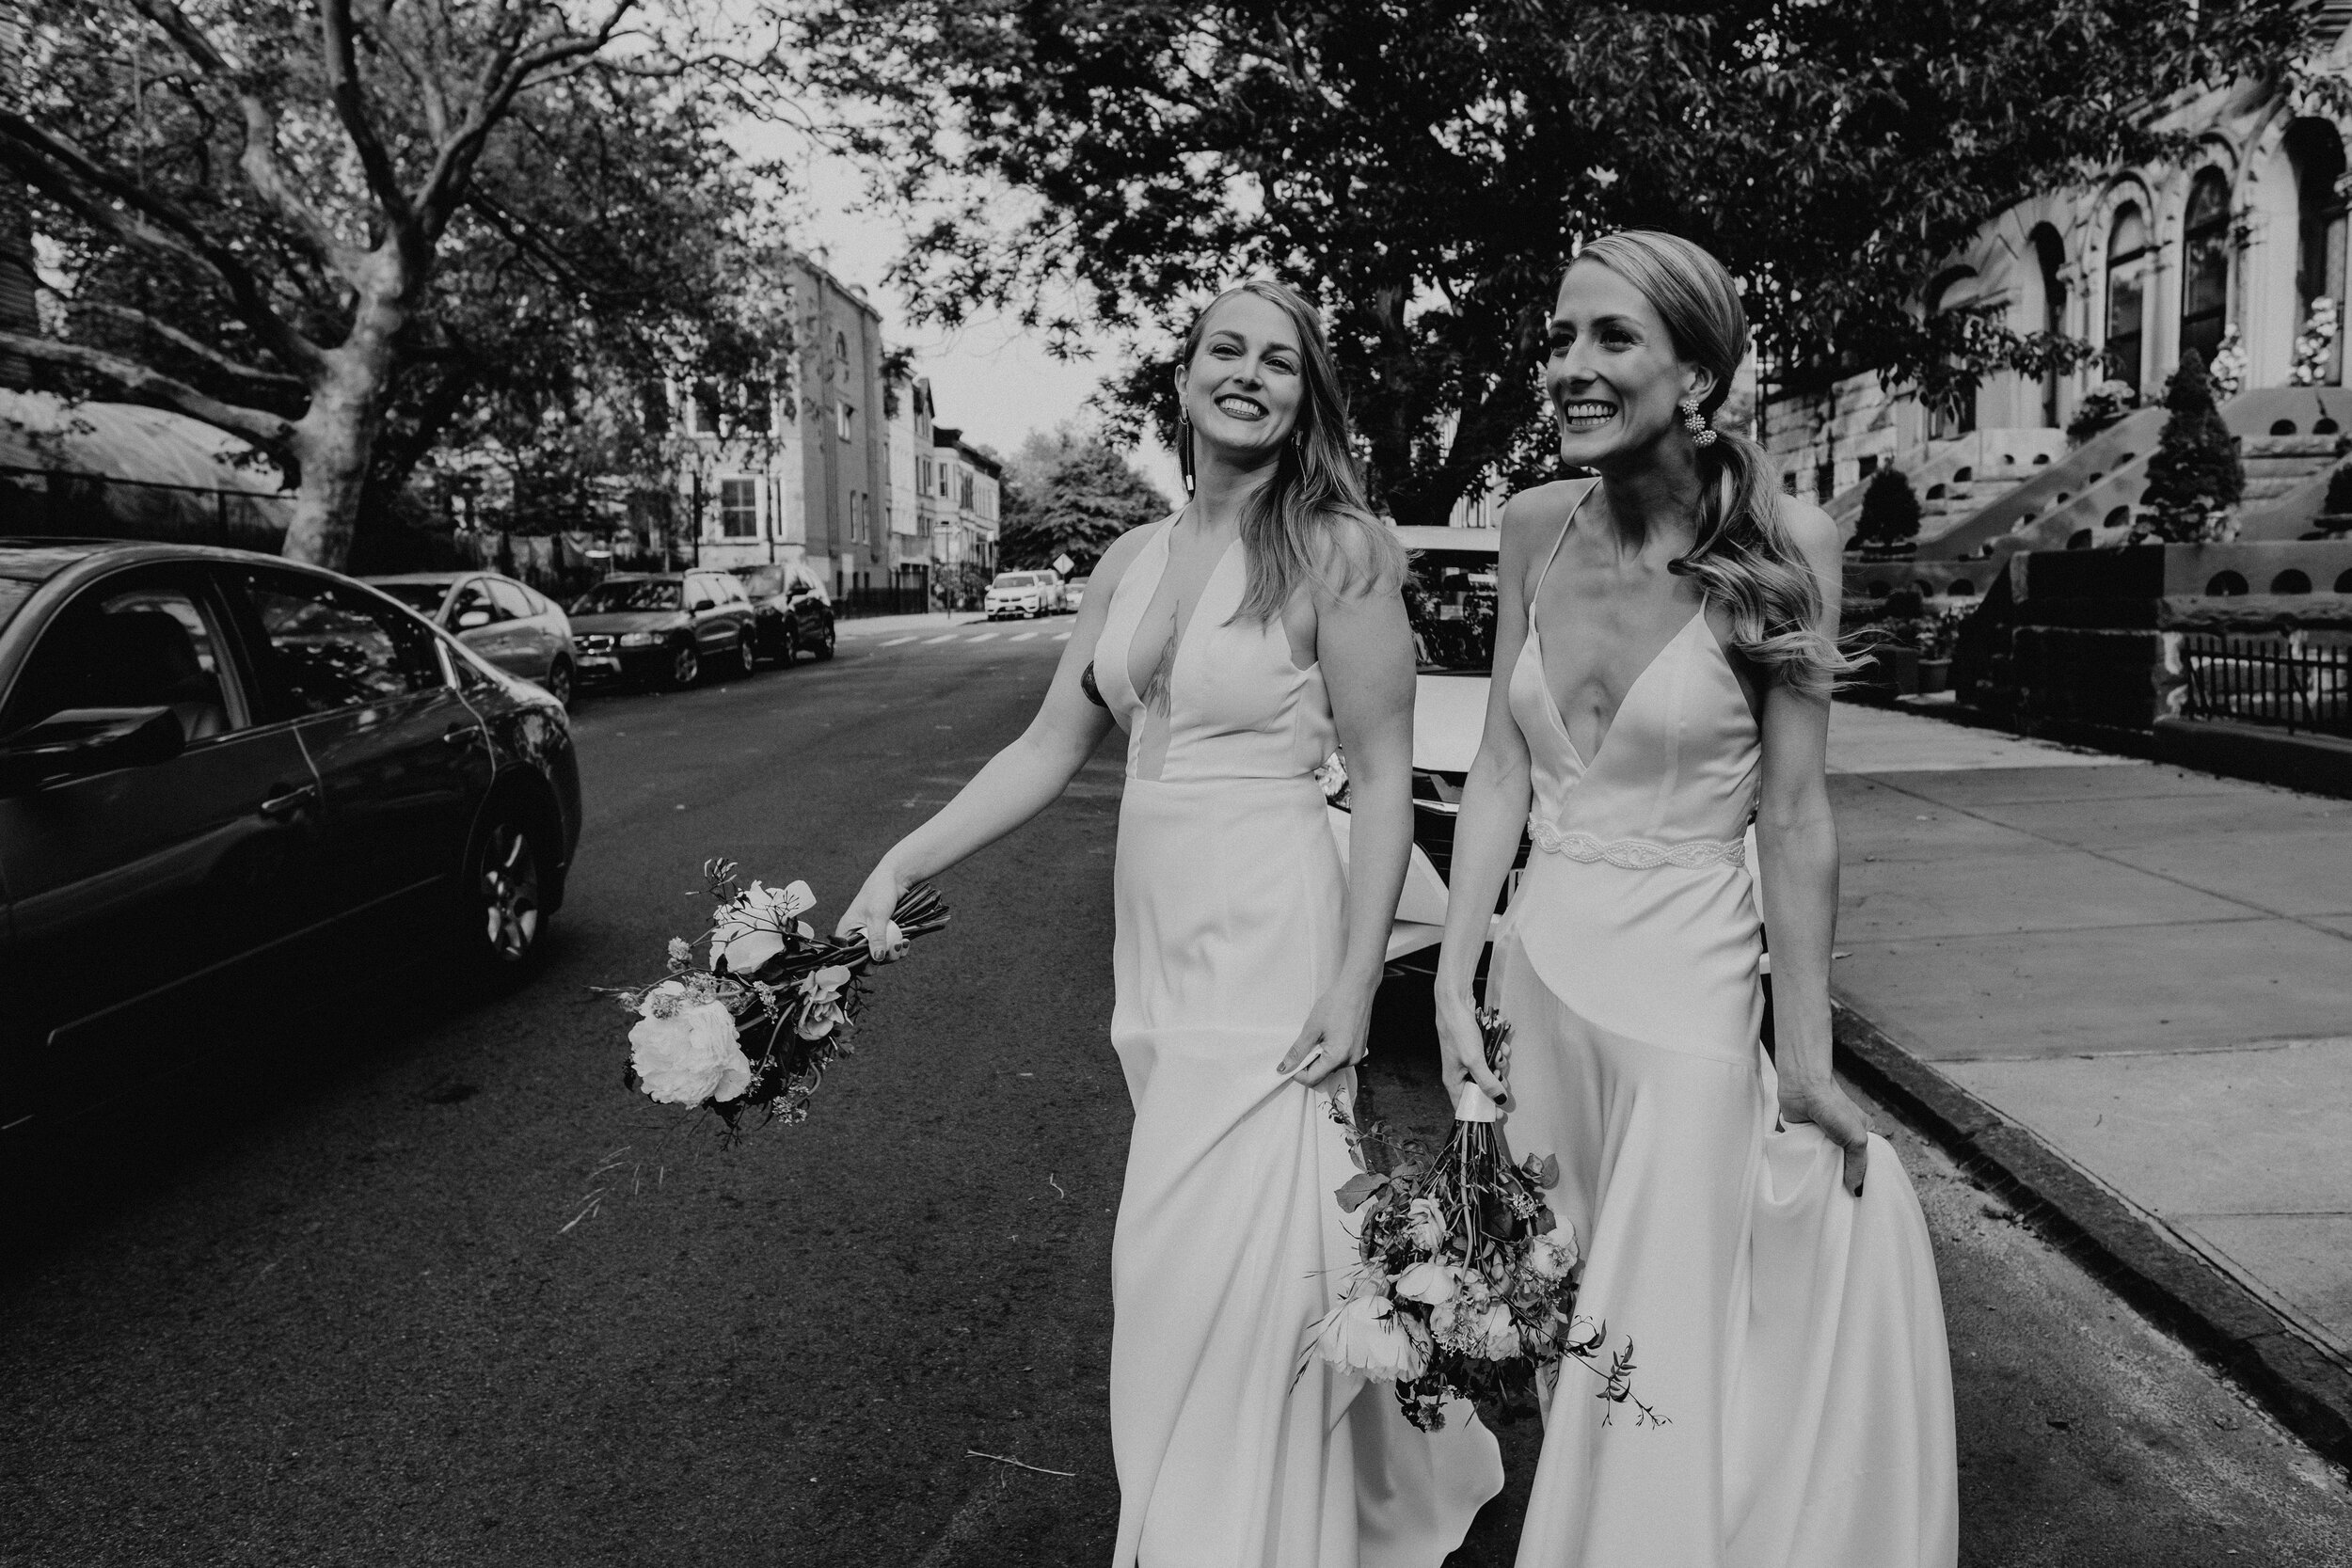 Katie_and_Malory_Akwaaba_Mansion_Wedding_Chellise_Michael_Photography_326.jpg